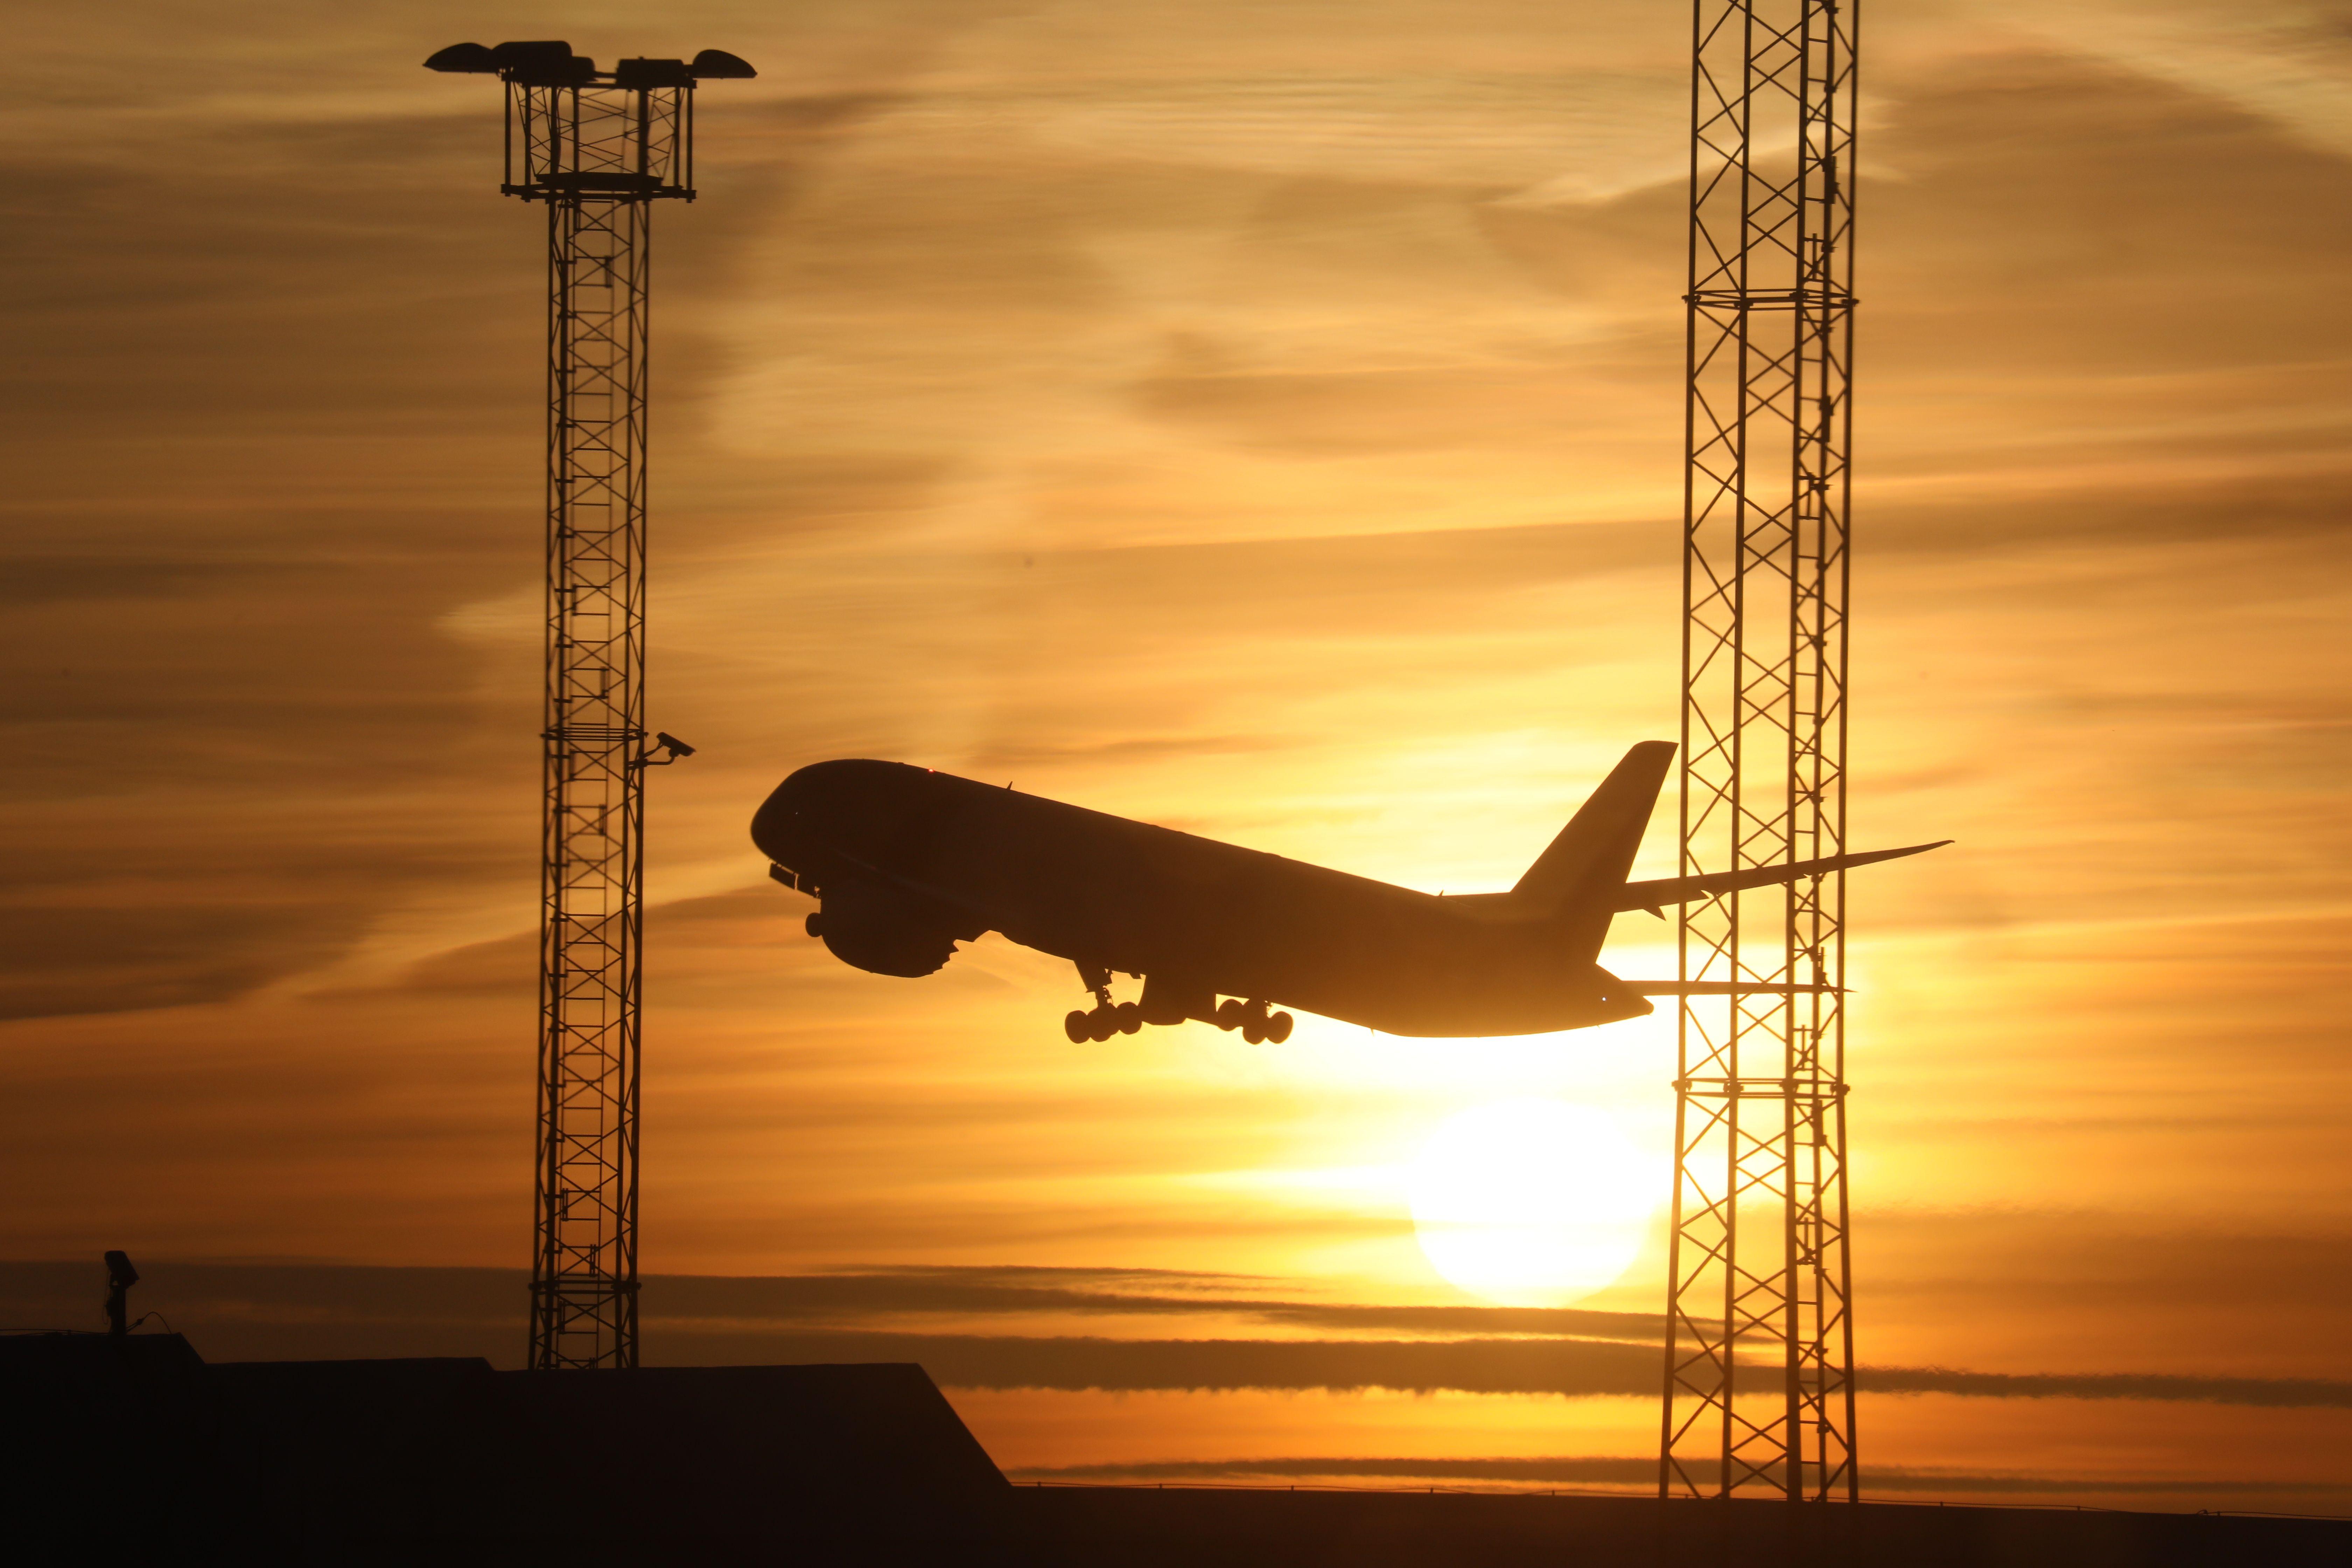 Millions more flights from Swedish airports despite environmental toll